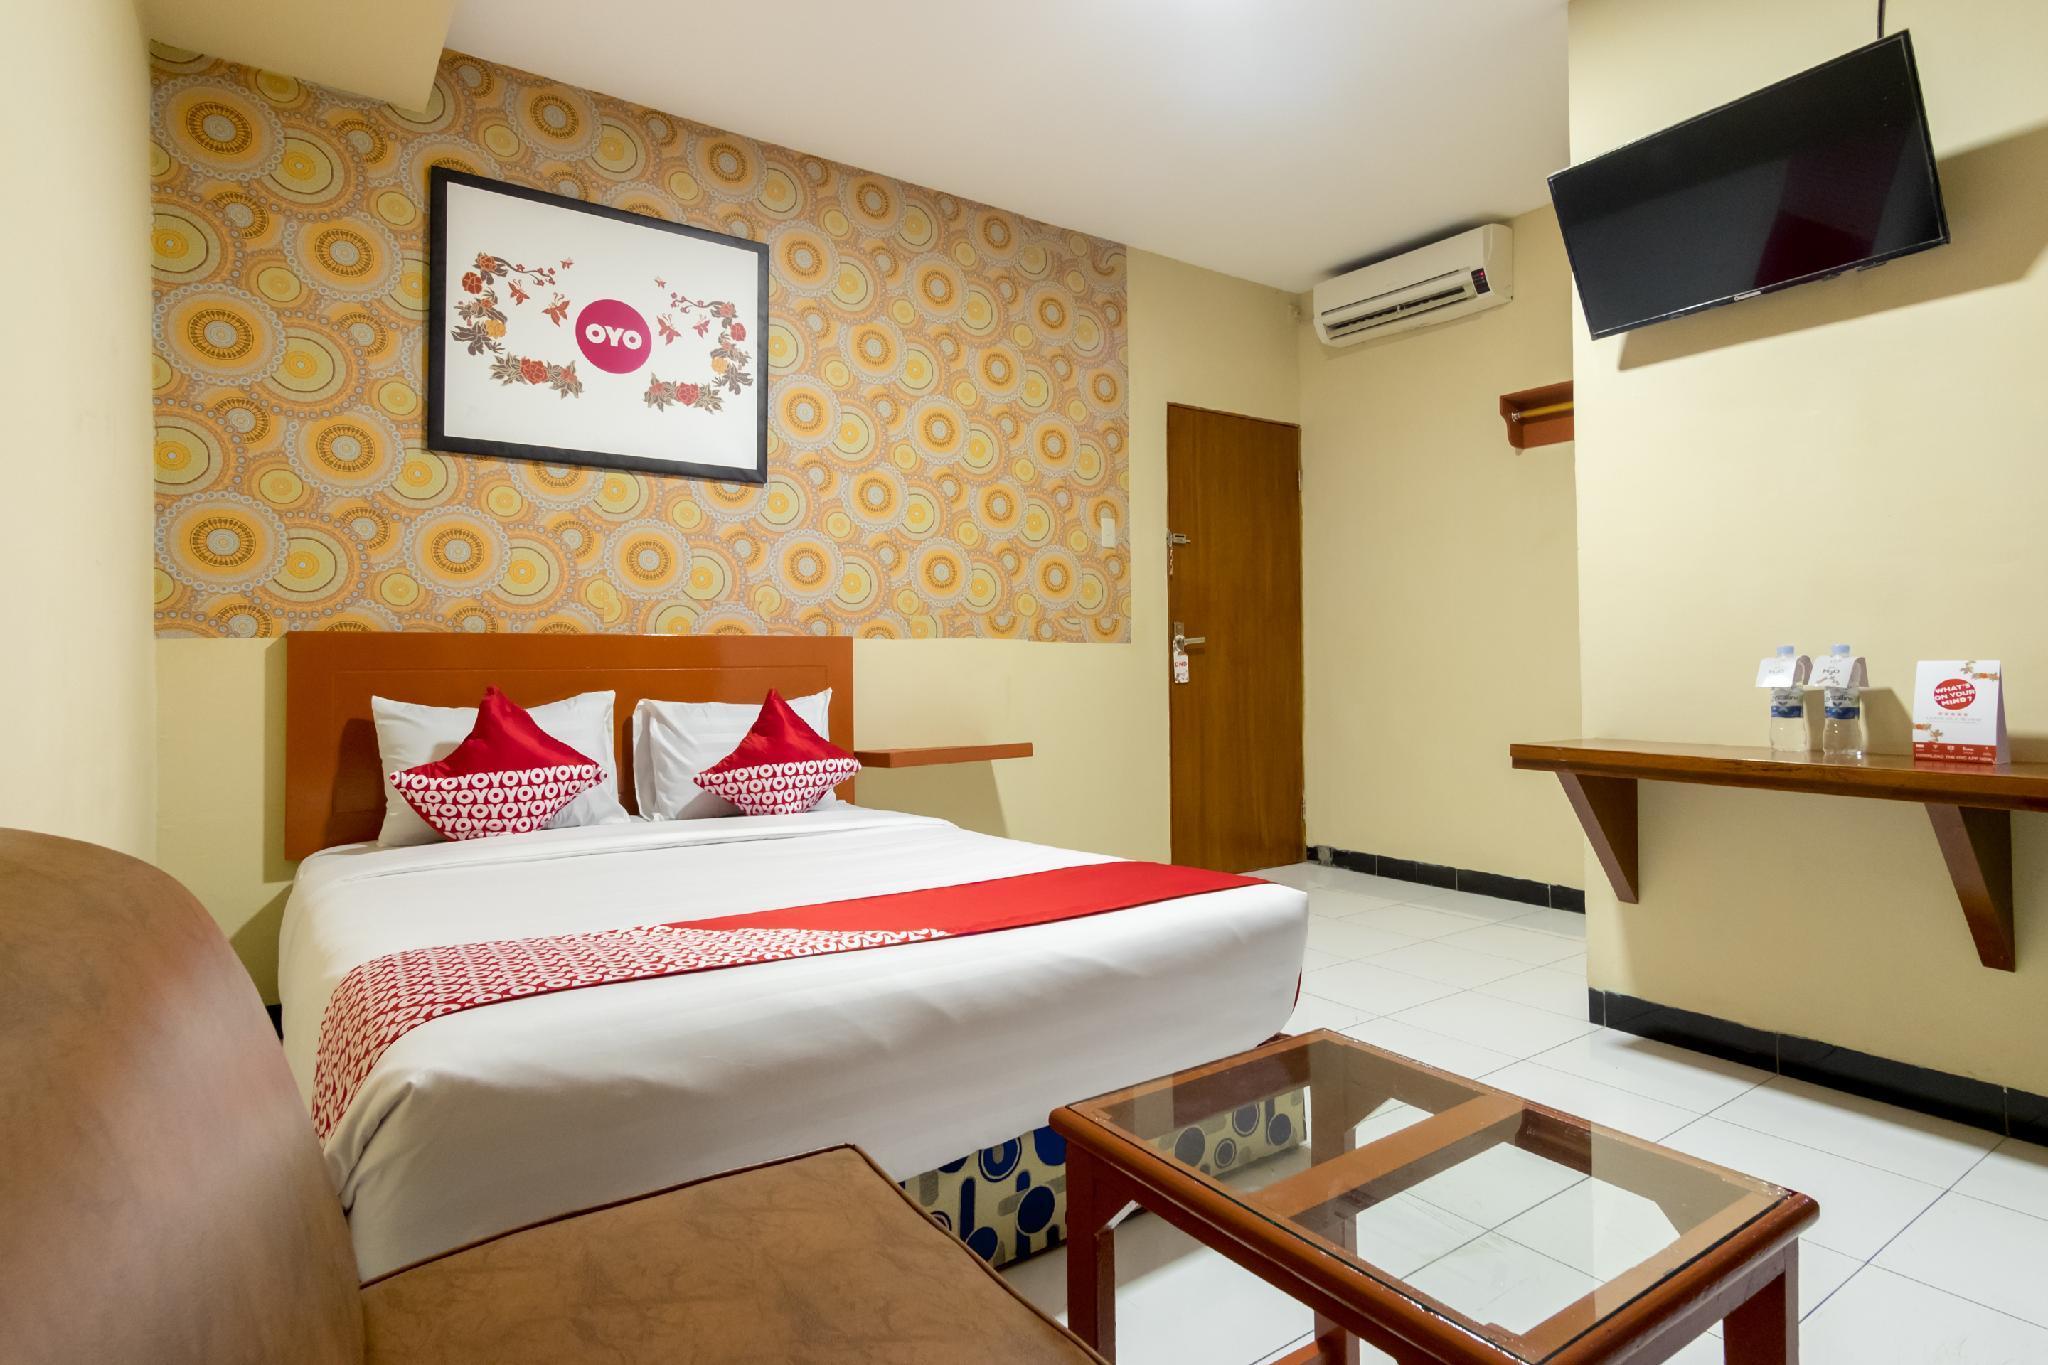 OYO 687 Residence Hotel Syariah